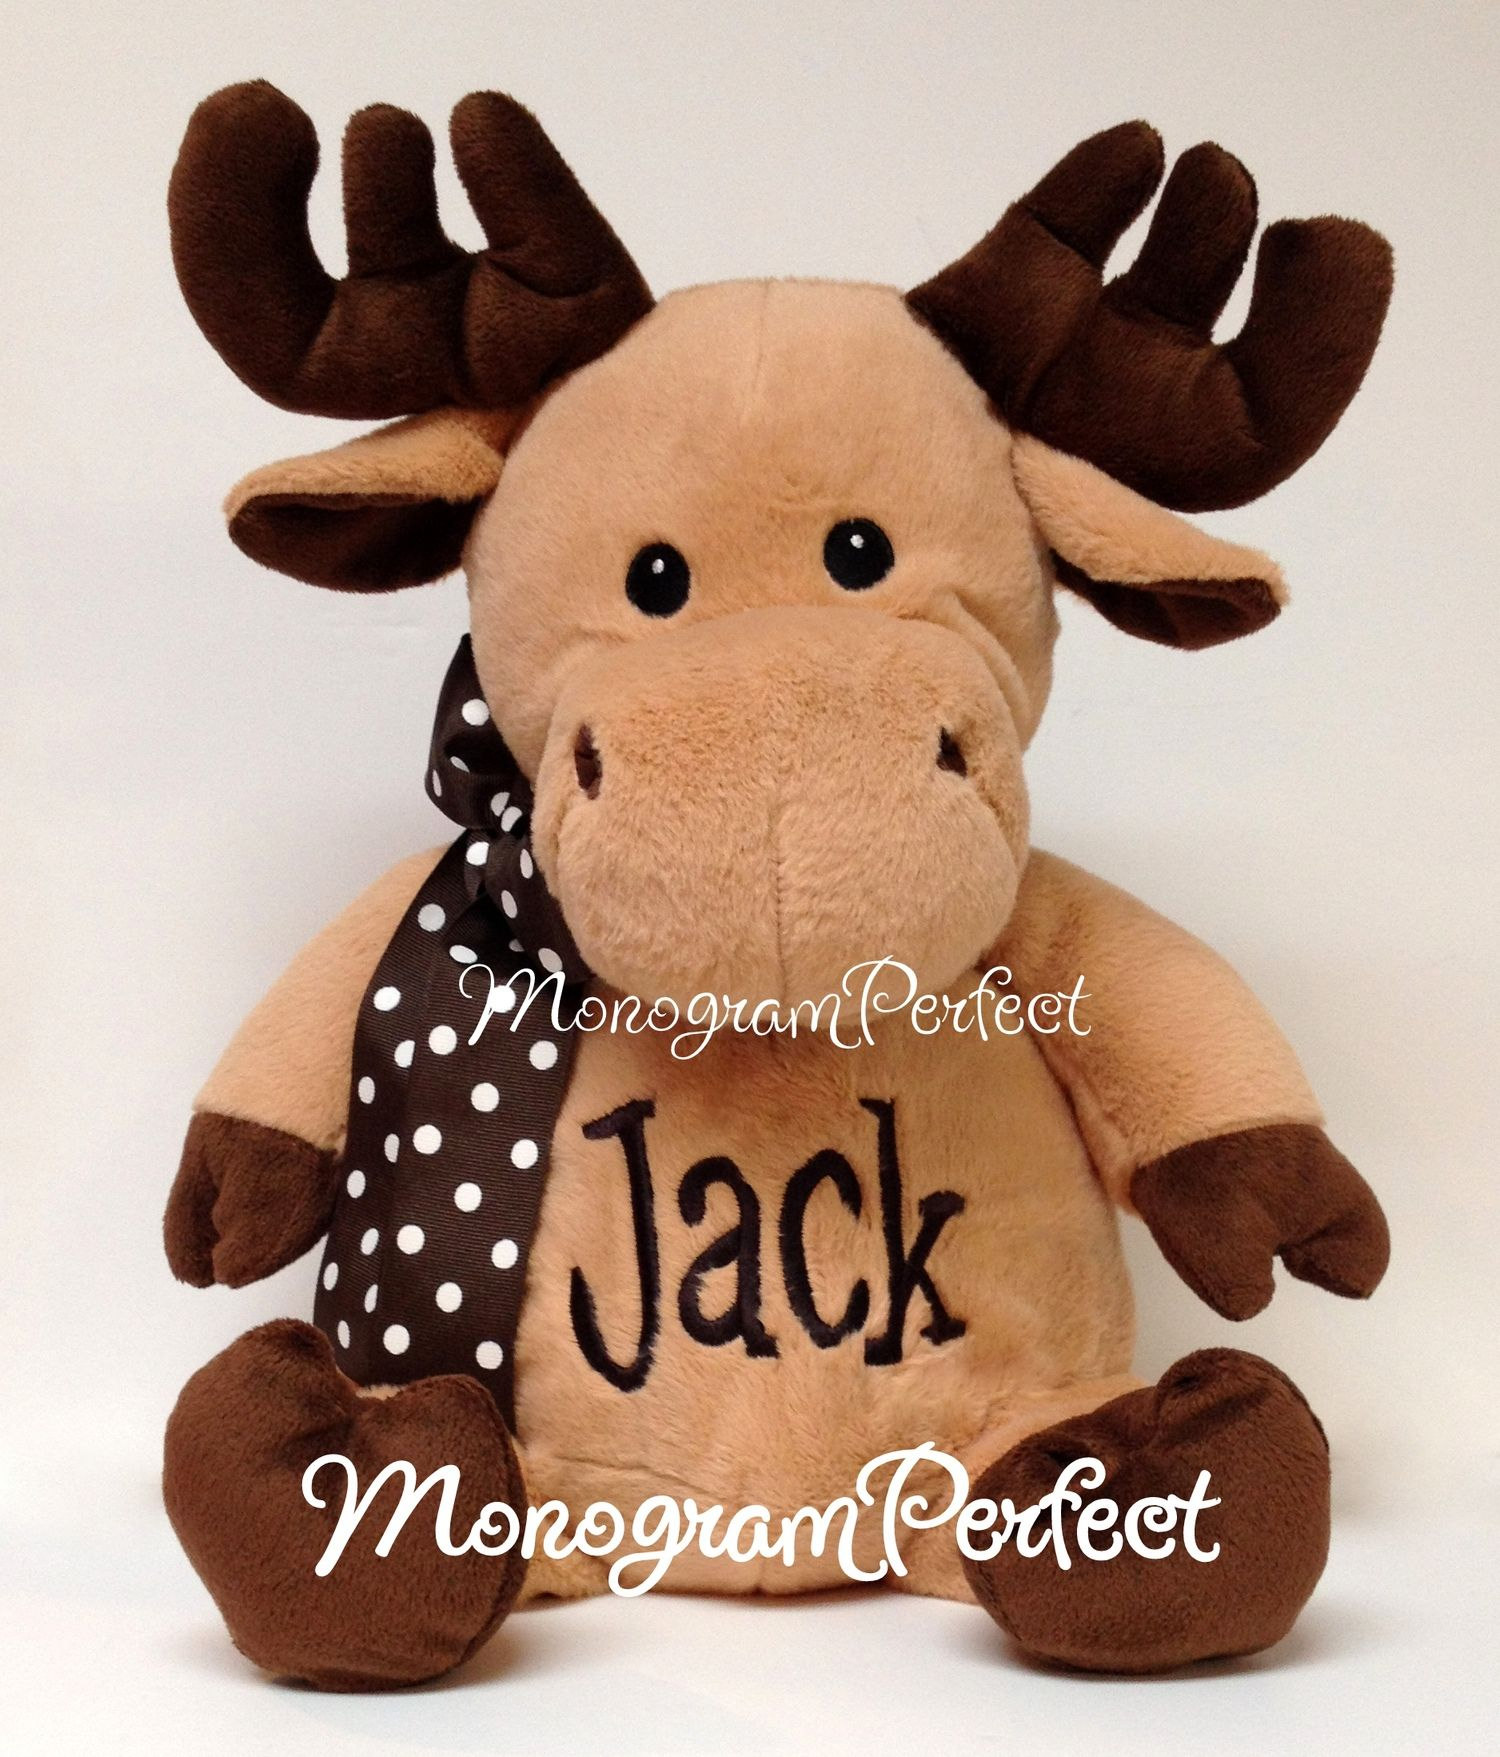 "Personalized 16"" Moose Stuffed Animal — MonogramPerfect"